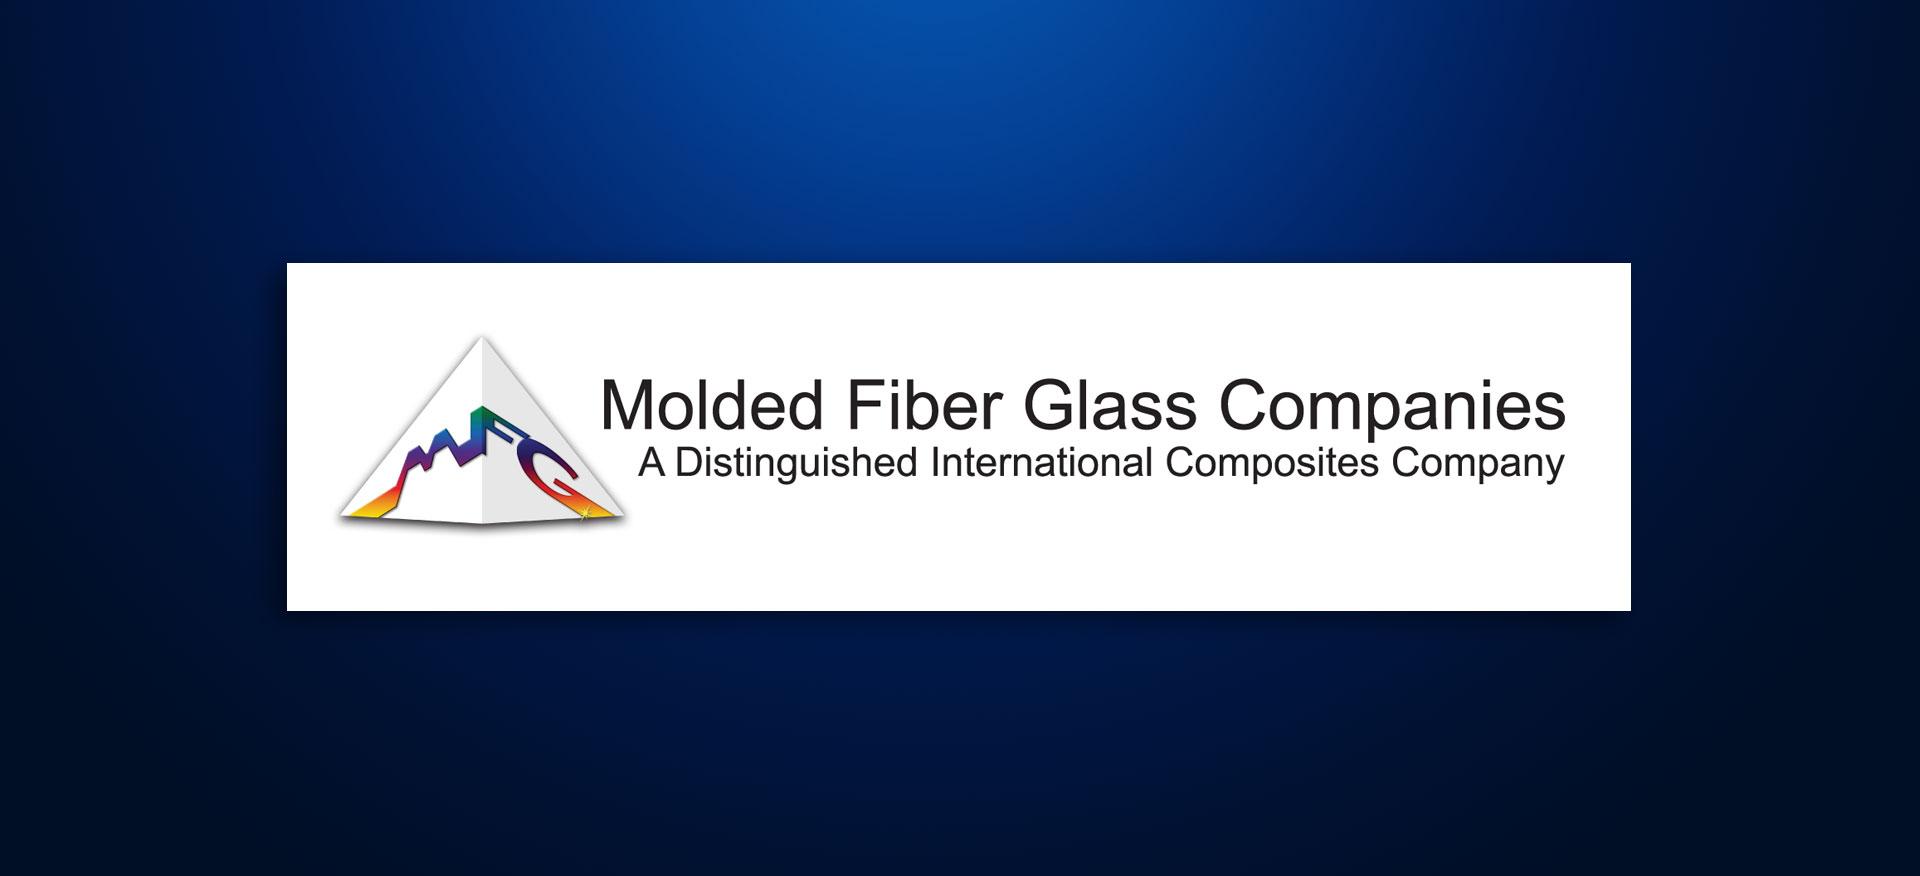 MFG Companies Molded Fiber Glass Companies